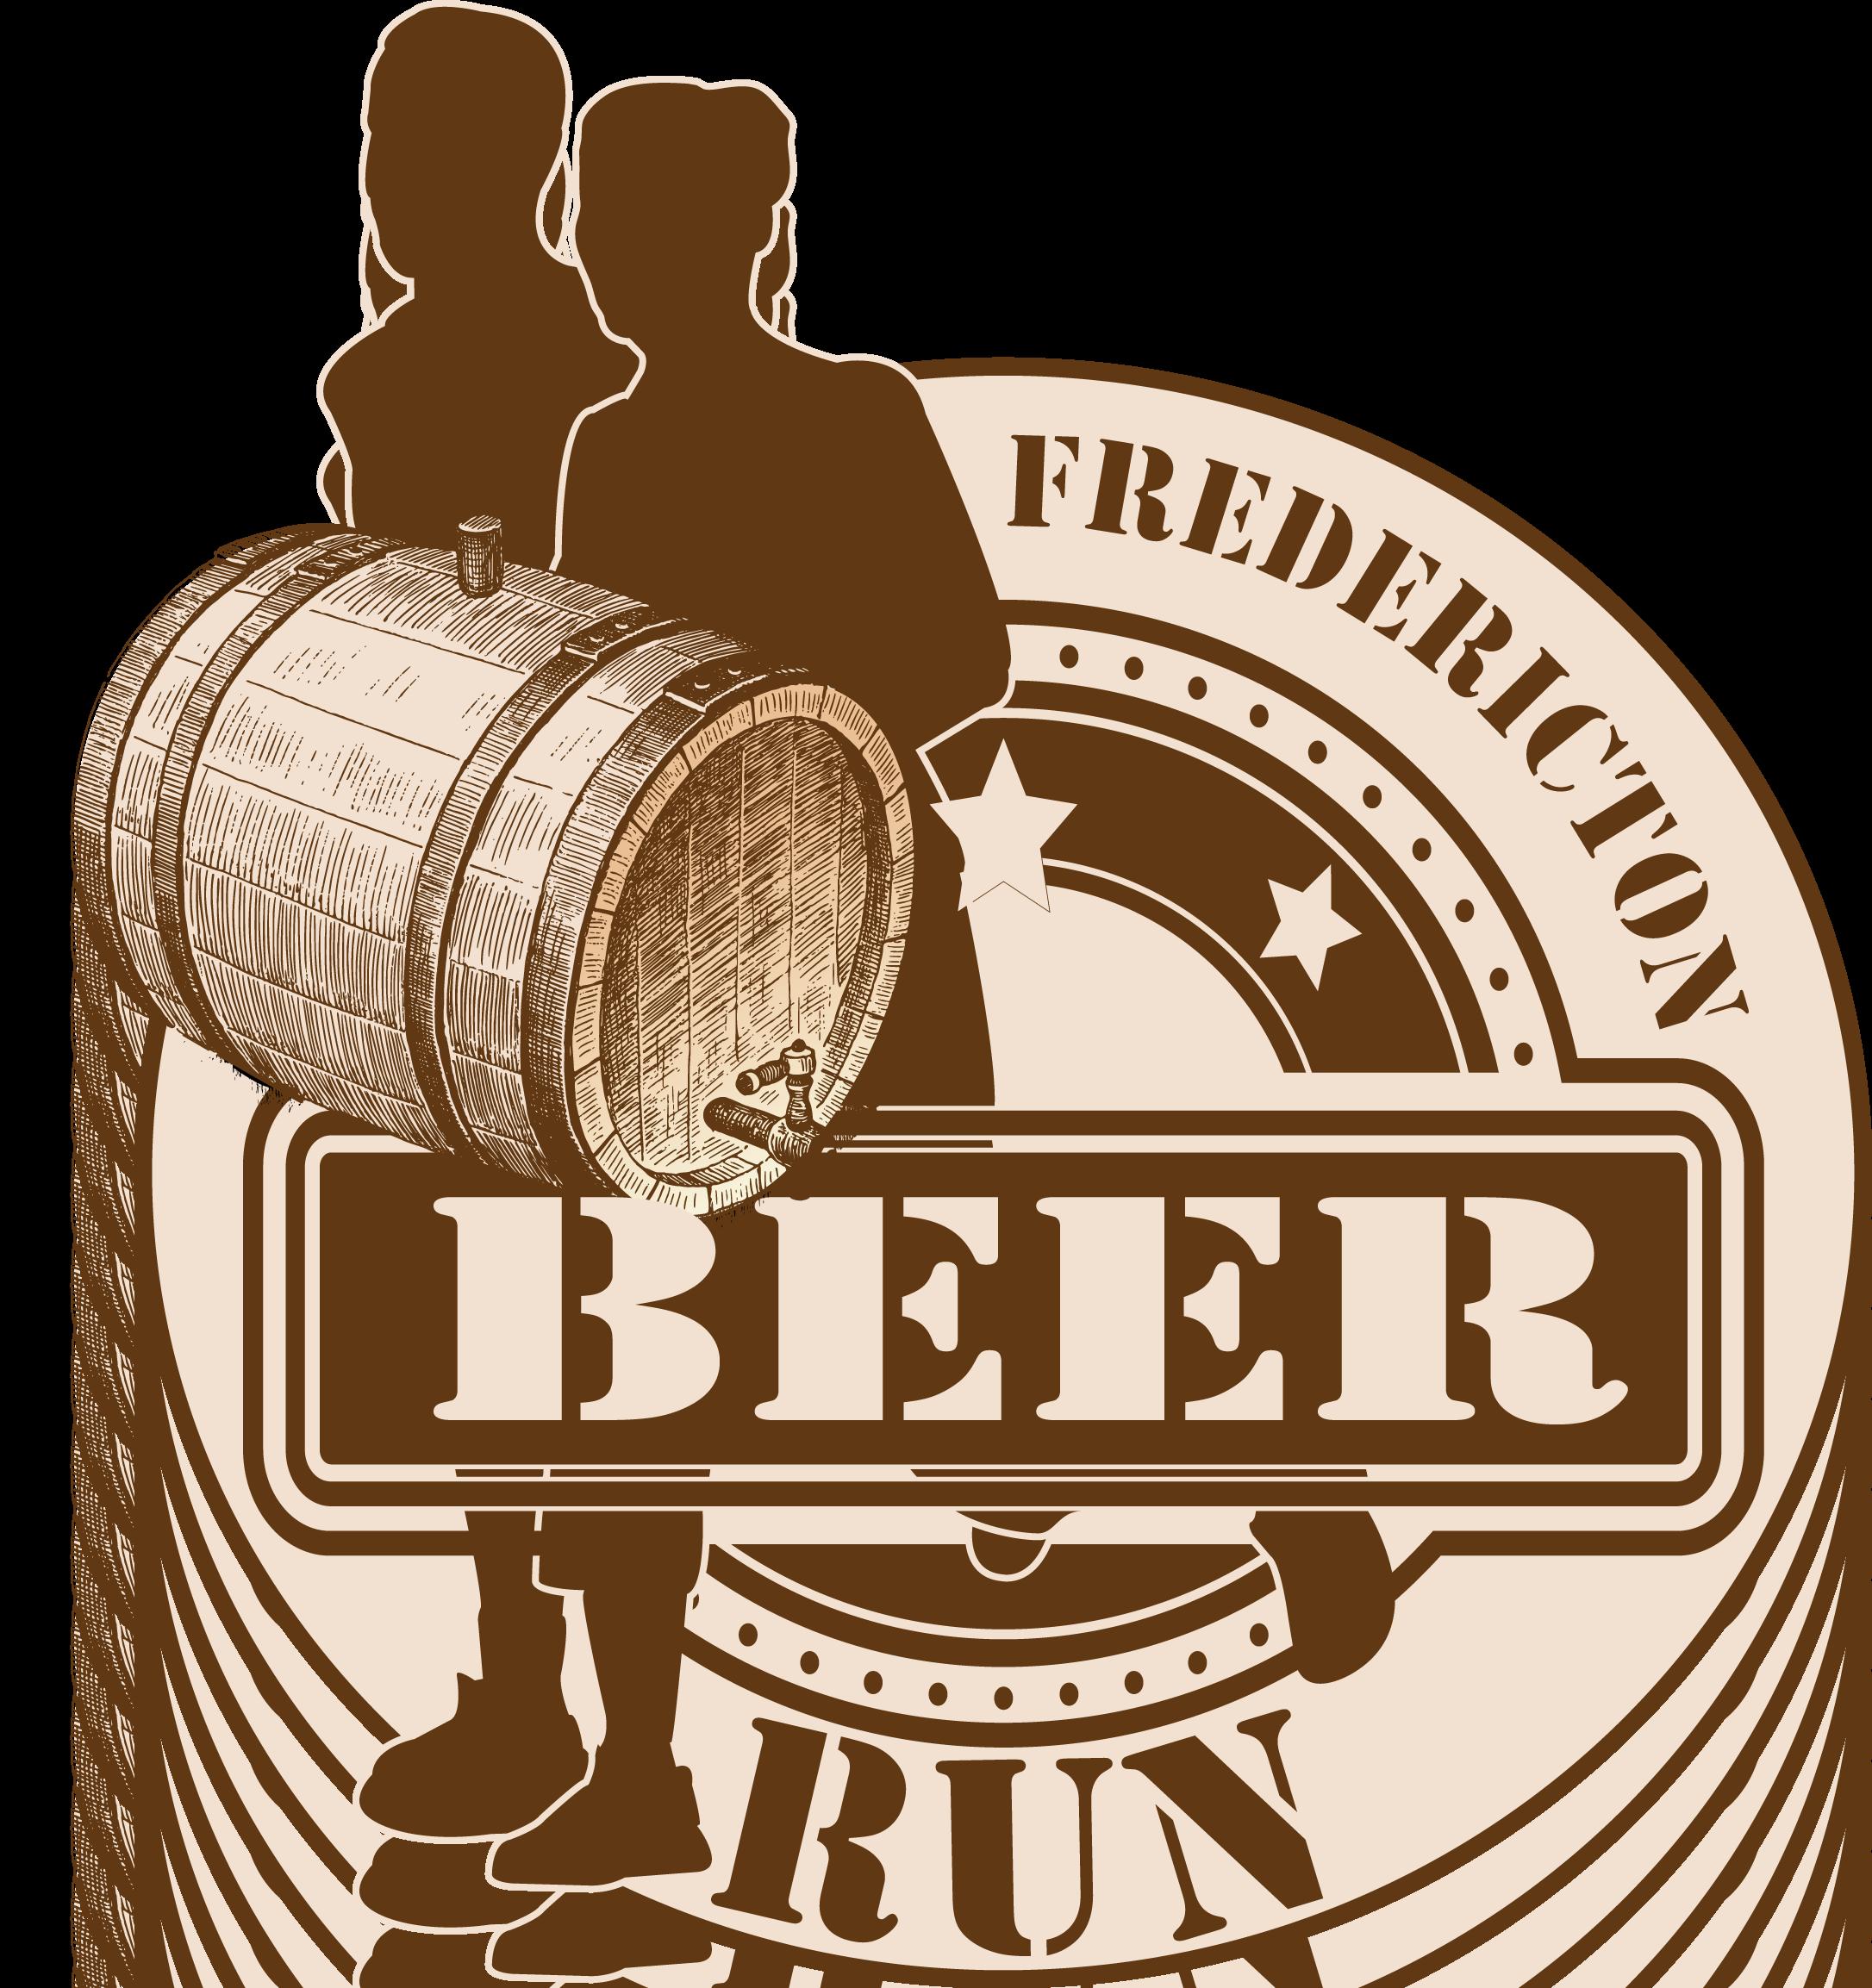 Fredericton Beer Run 2022